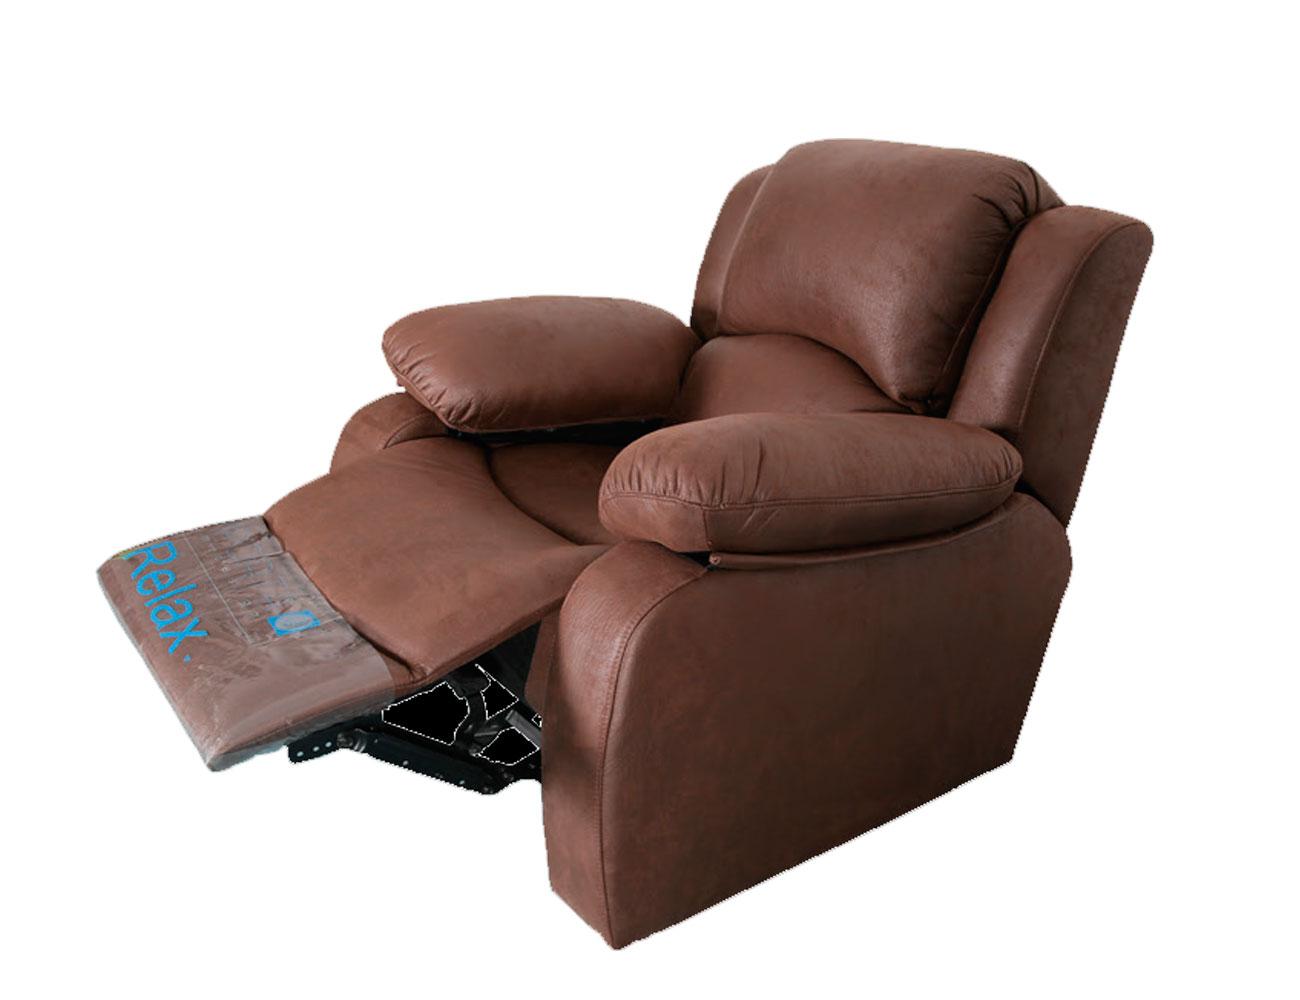 Sillon relax manual mecedora balancin 2